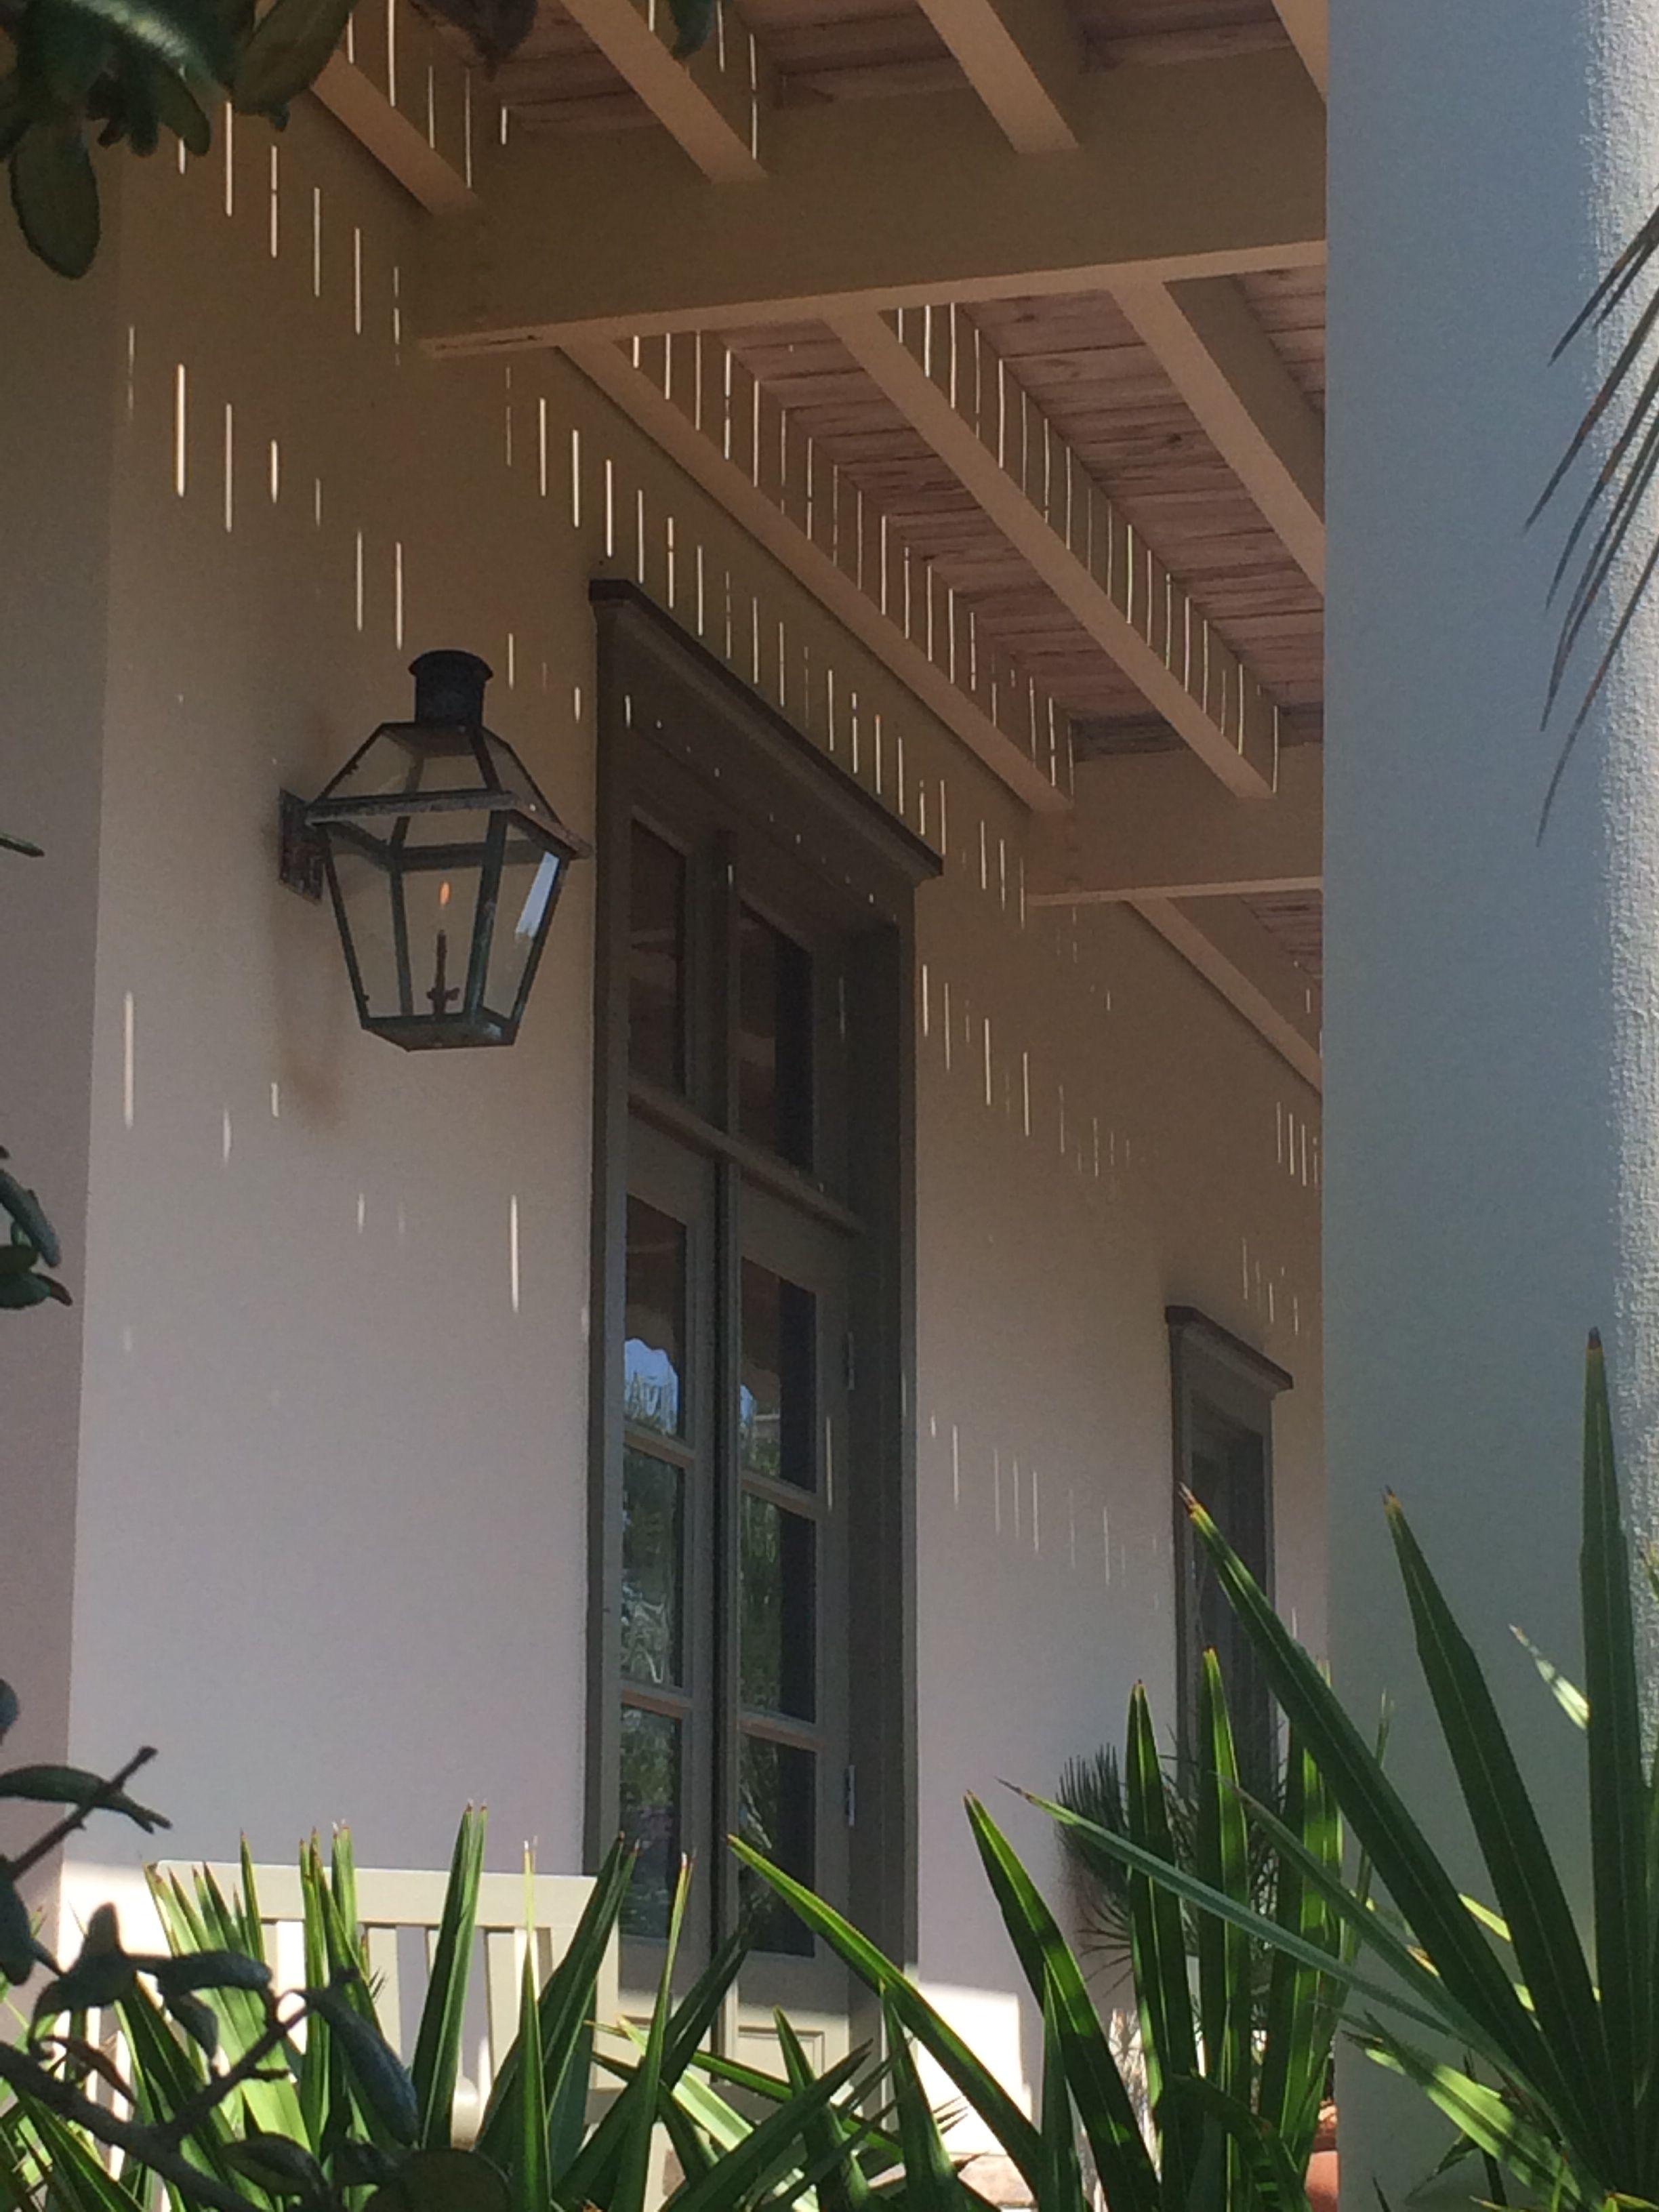 Pin by dina sharp on home pinterest doors